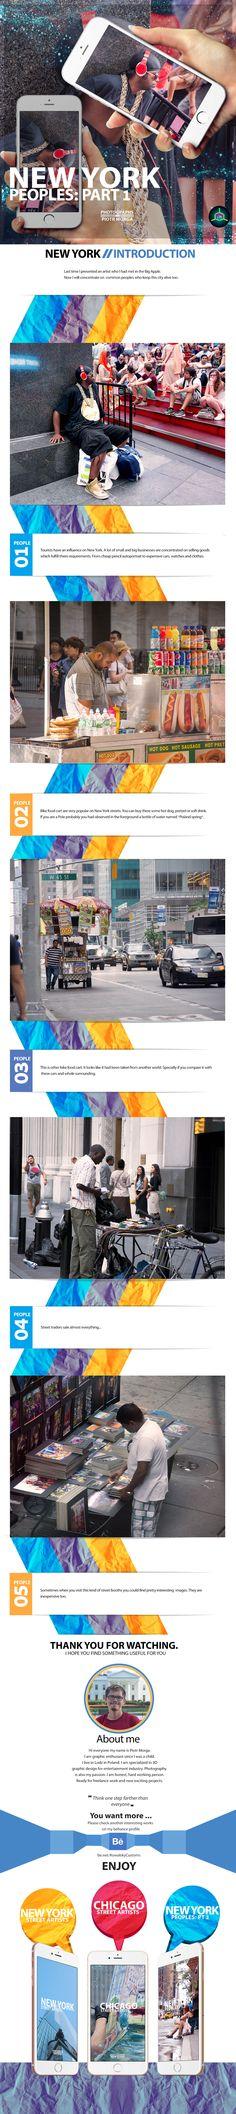 NYC_peoples